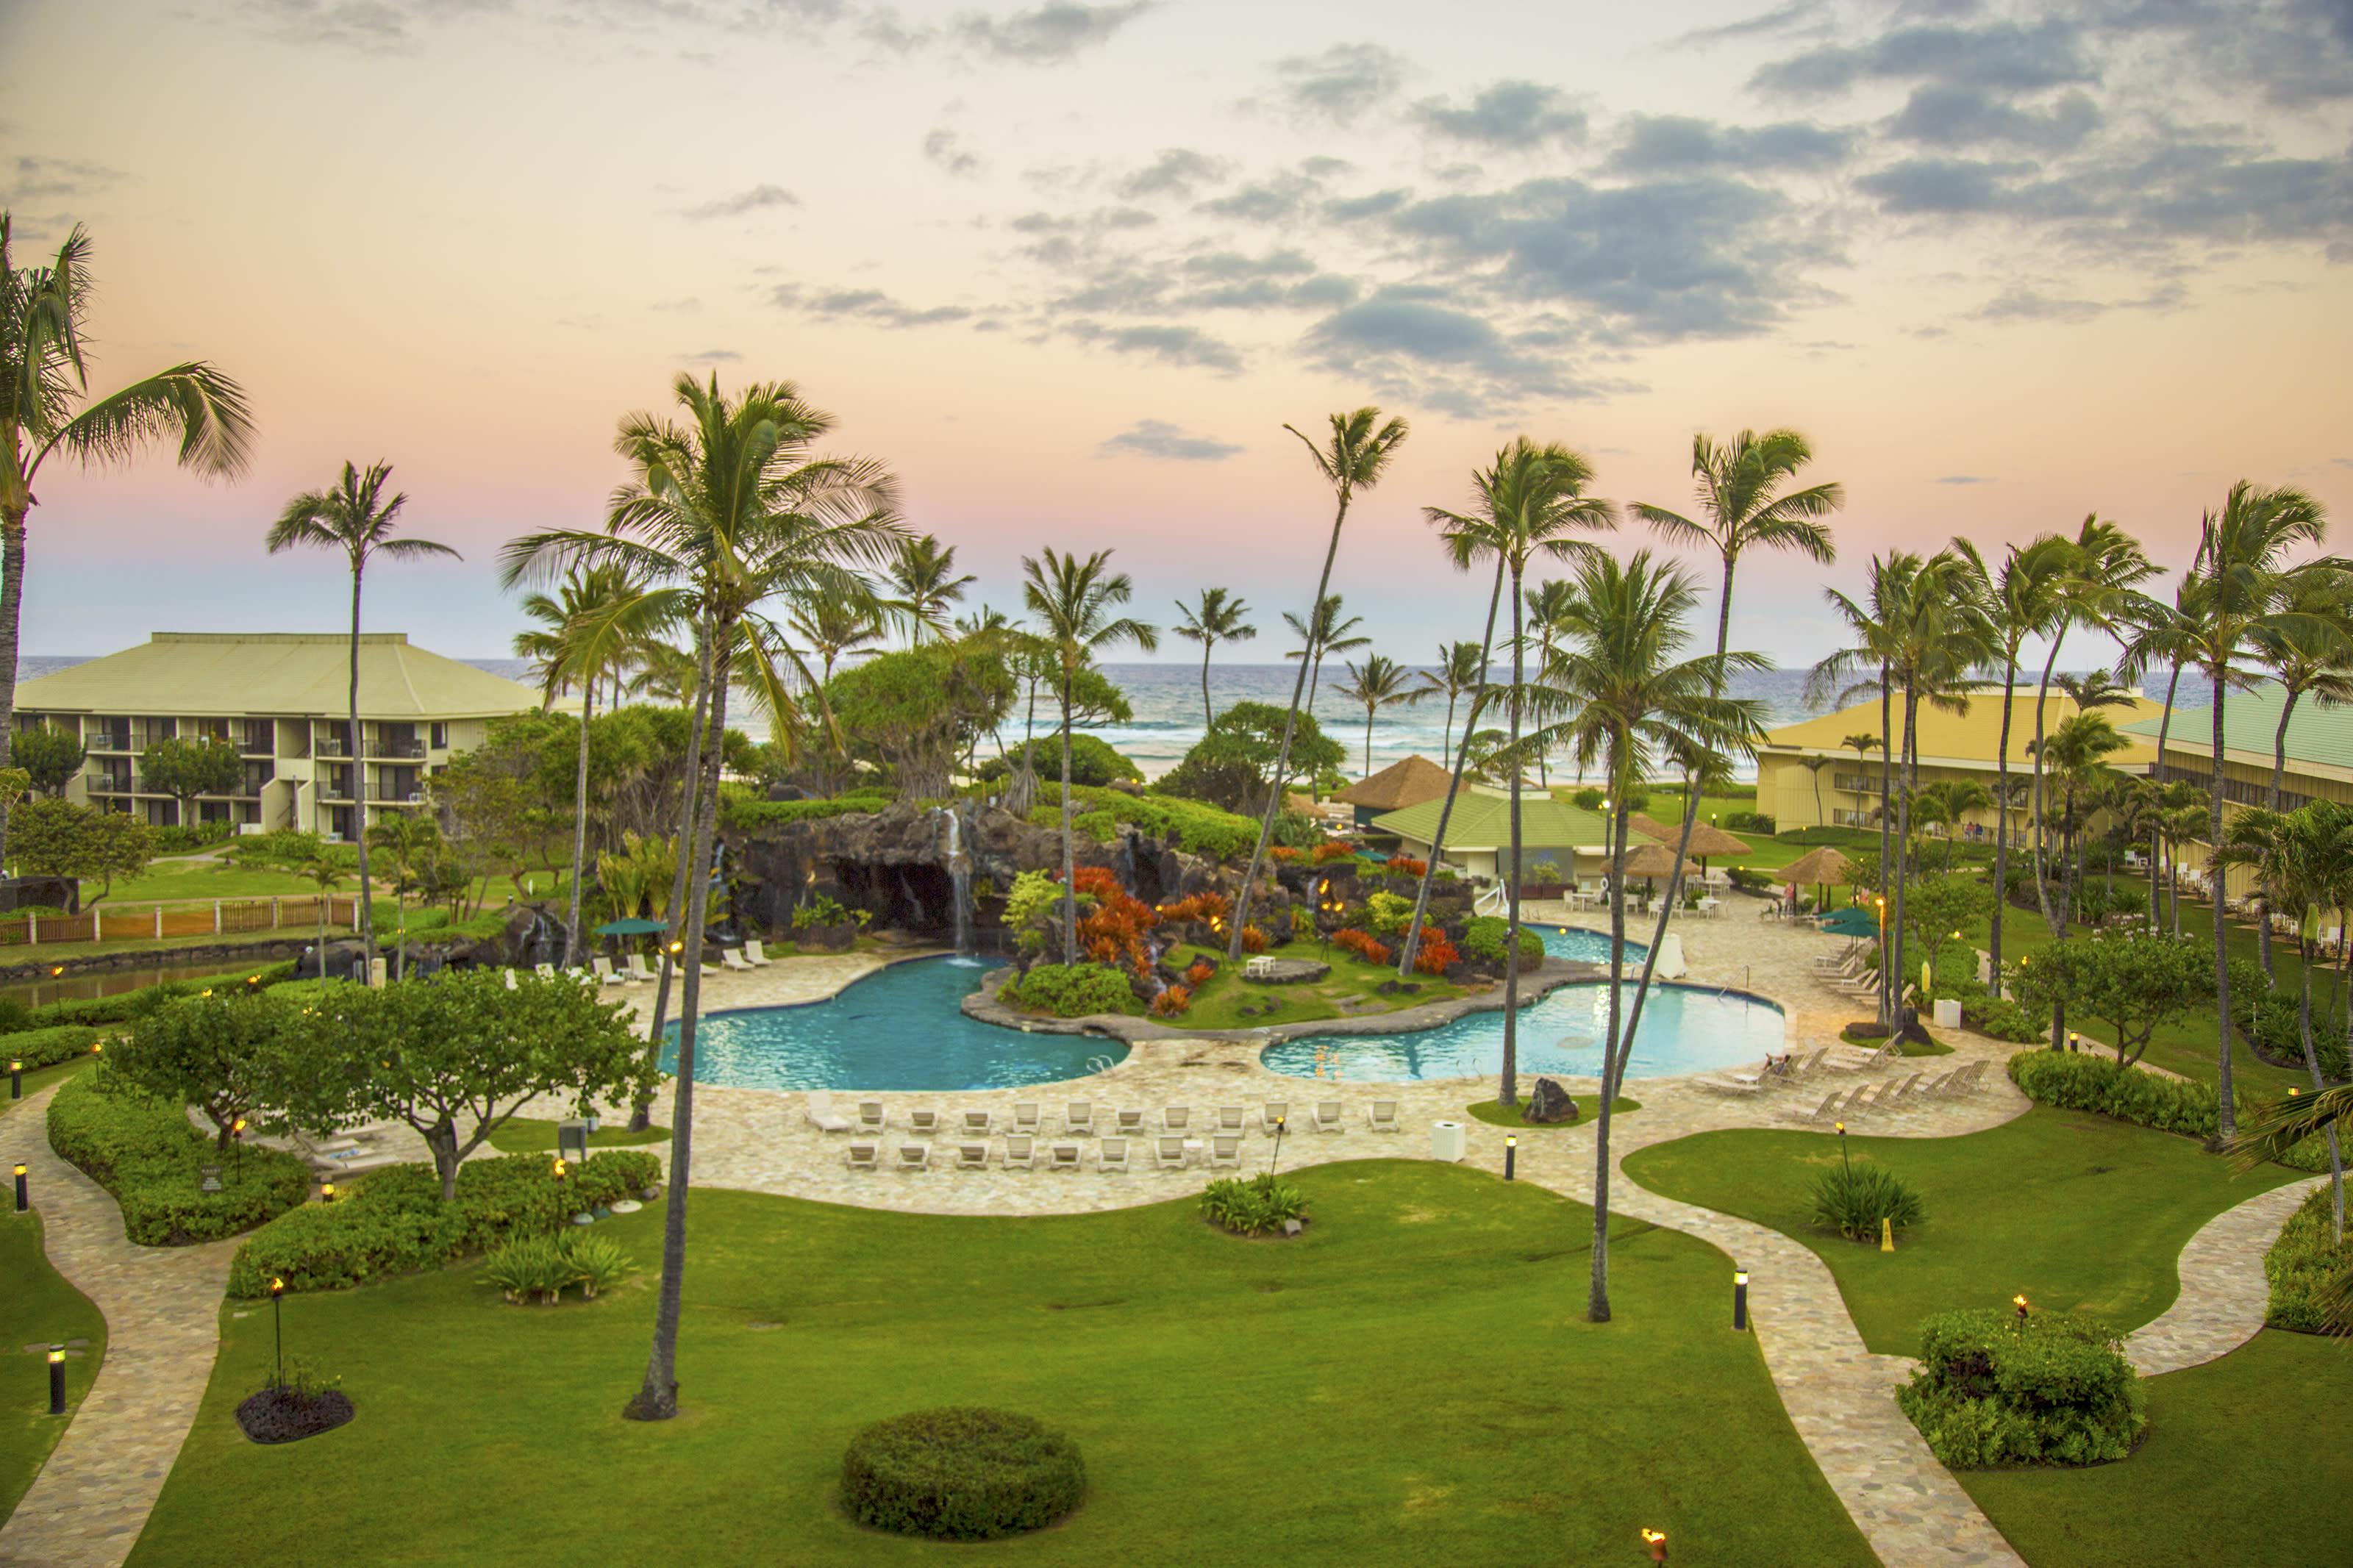 Kauai Beach Resort View Larger Image